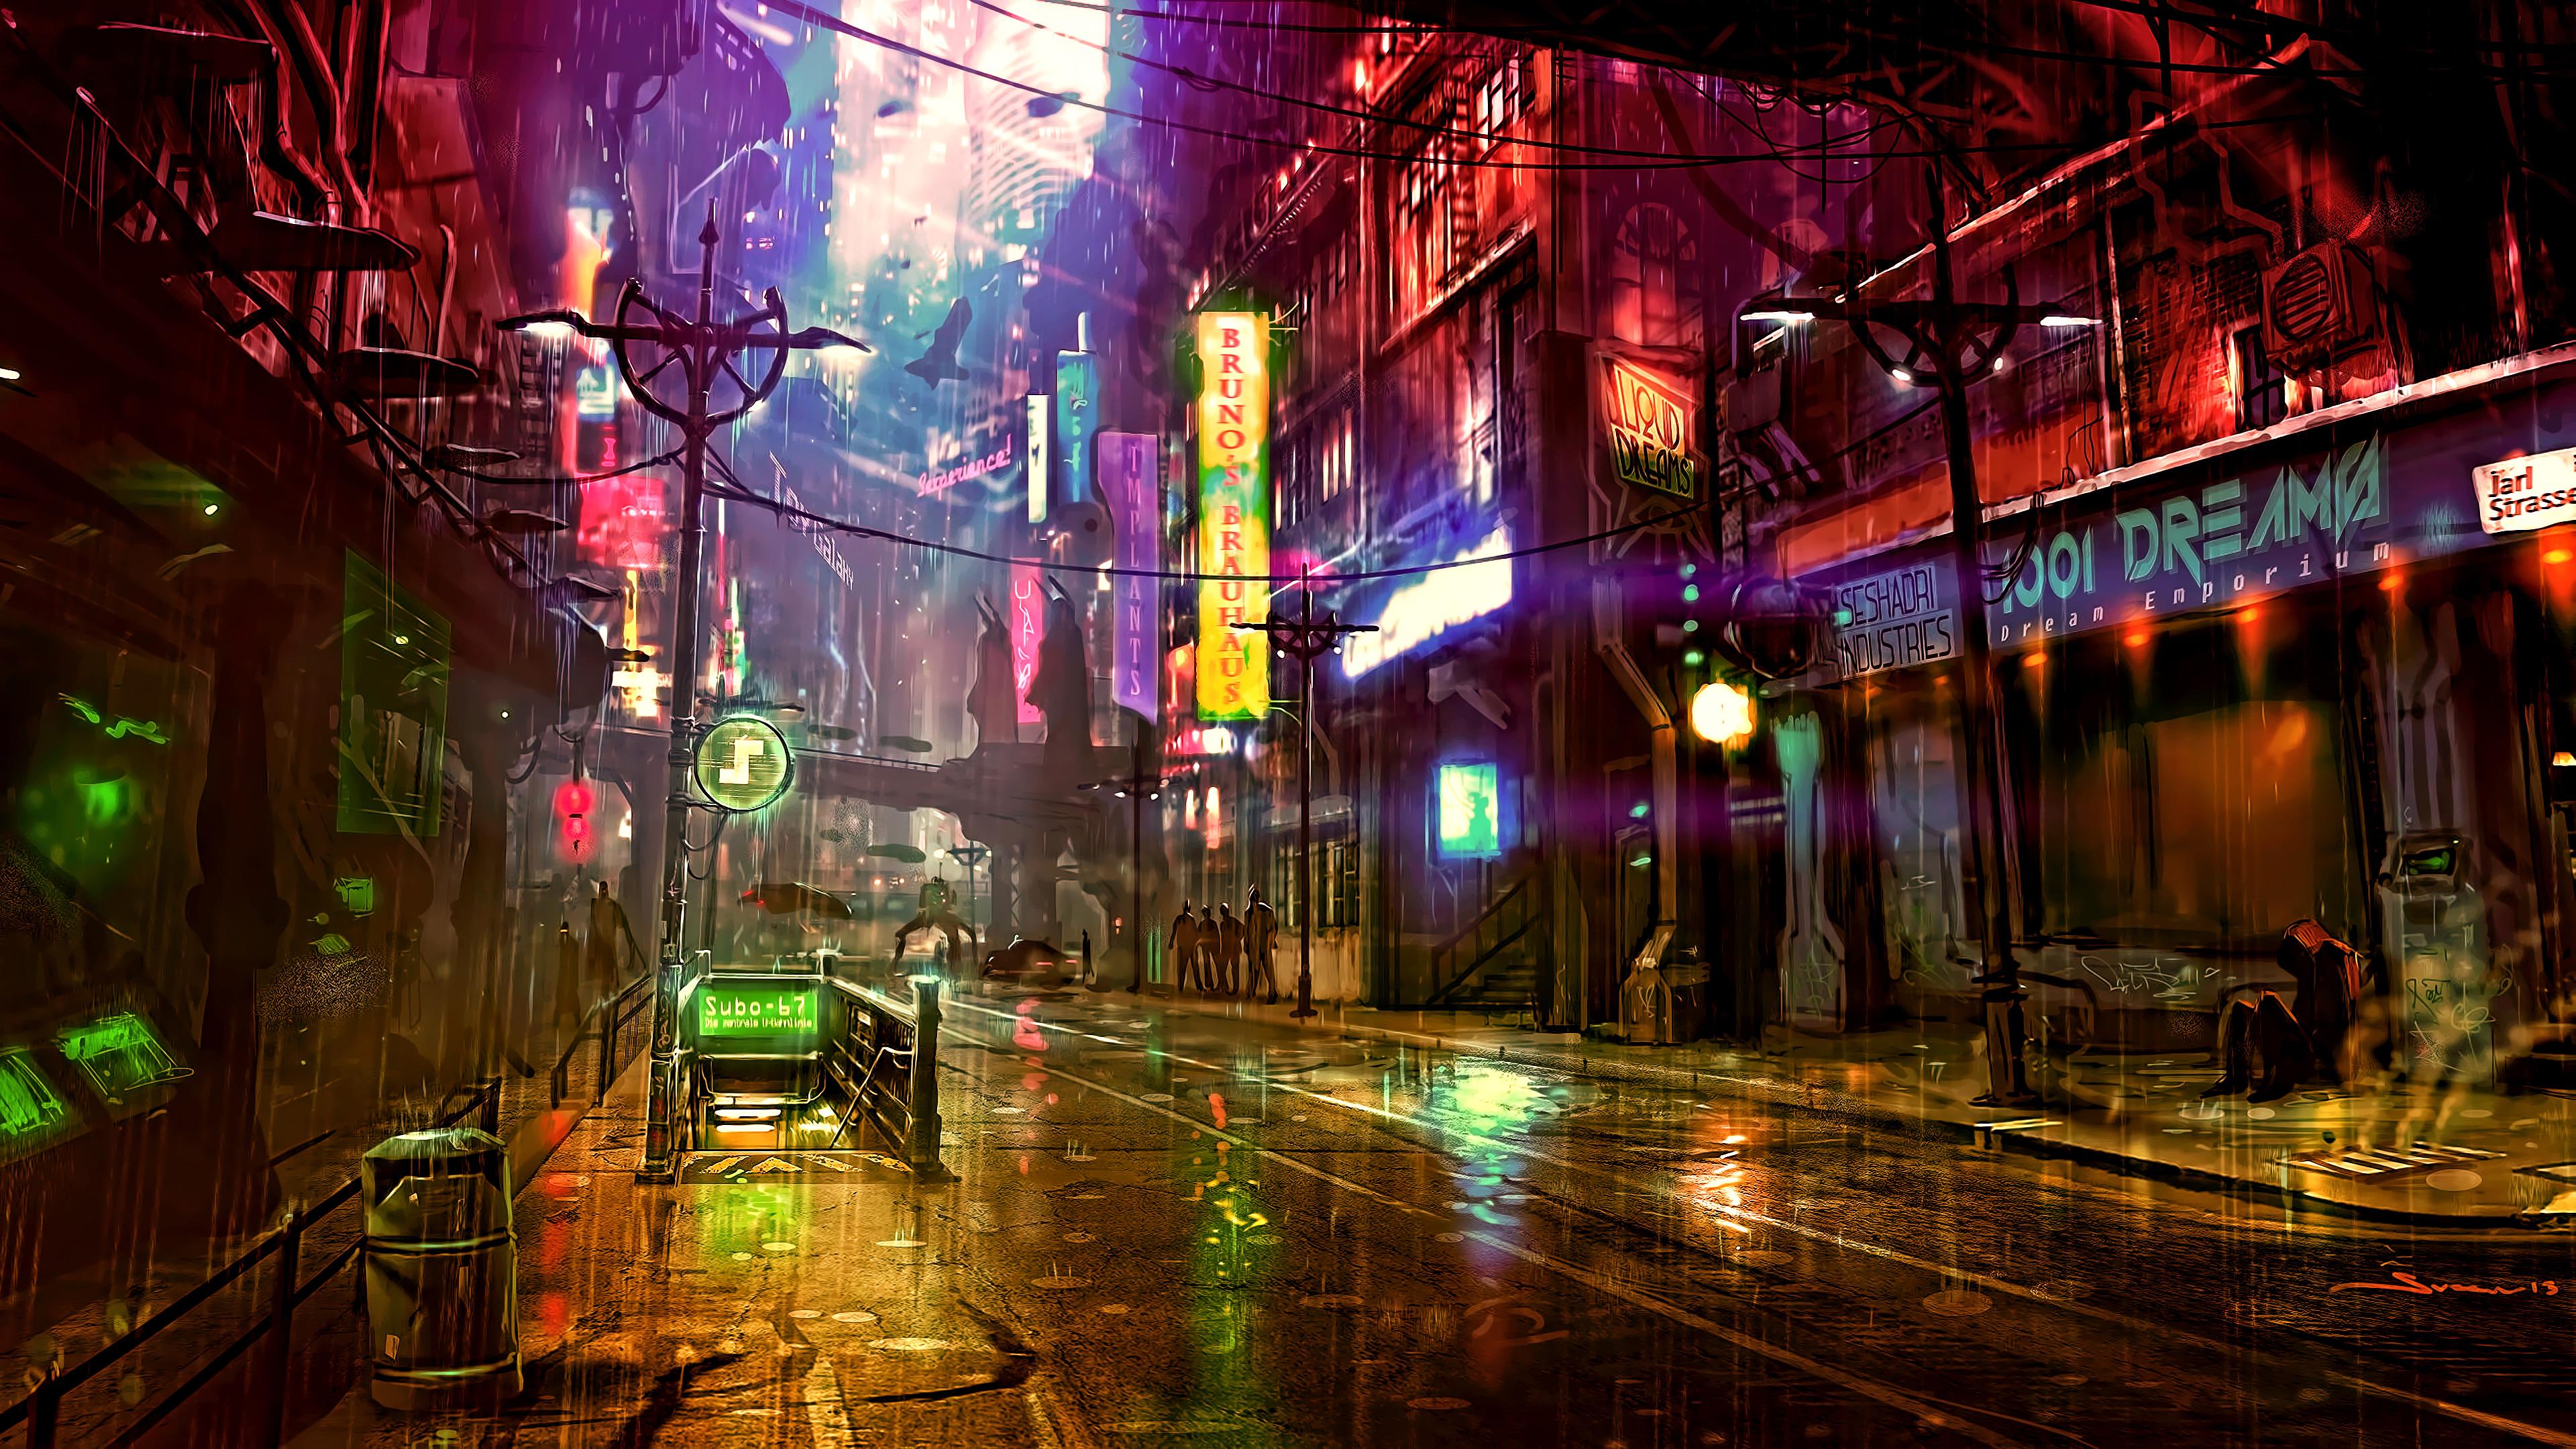 futuristic city cyberpunk neon street digital art 4k 1540754260 - Futuristic City Cyberpunk Neon Street Digital Art 4k - street wallpapers, neon wallpapers, hd-wallpapers, digital art wallpapers, cyberpunk wallpapers, artwork wallpapers, artist wallpapers, 4k-wallpapers